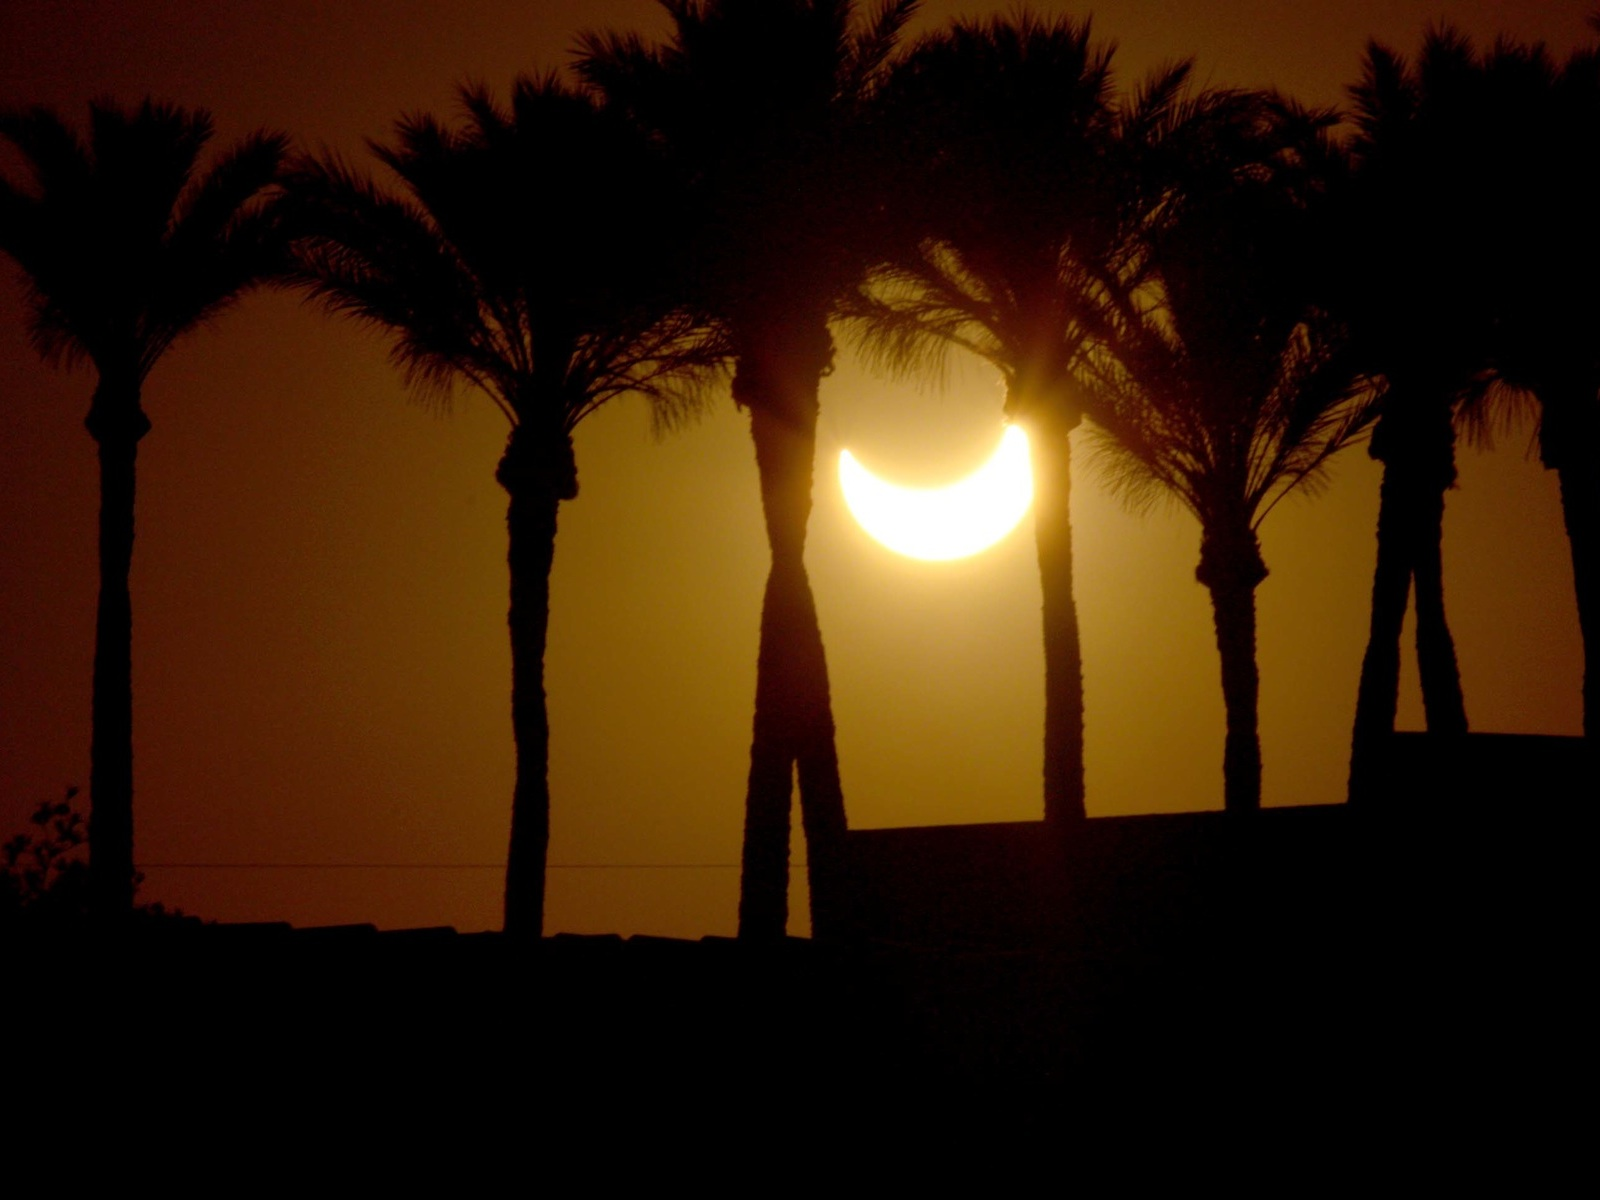 Eclipse Rocking Among the Palms